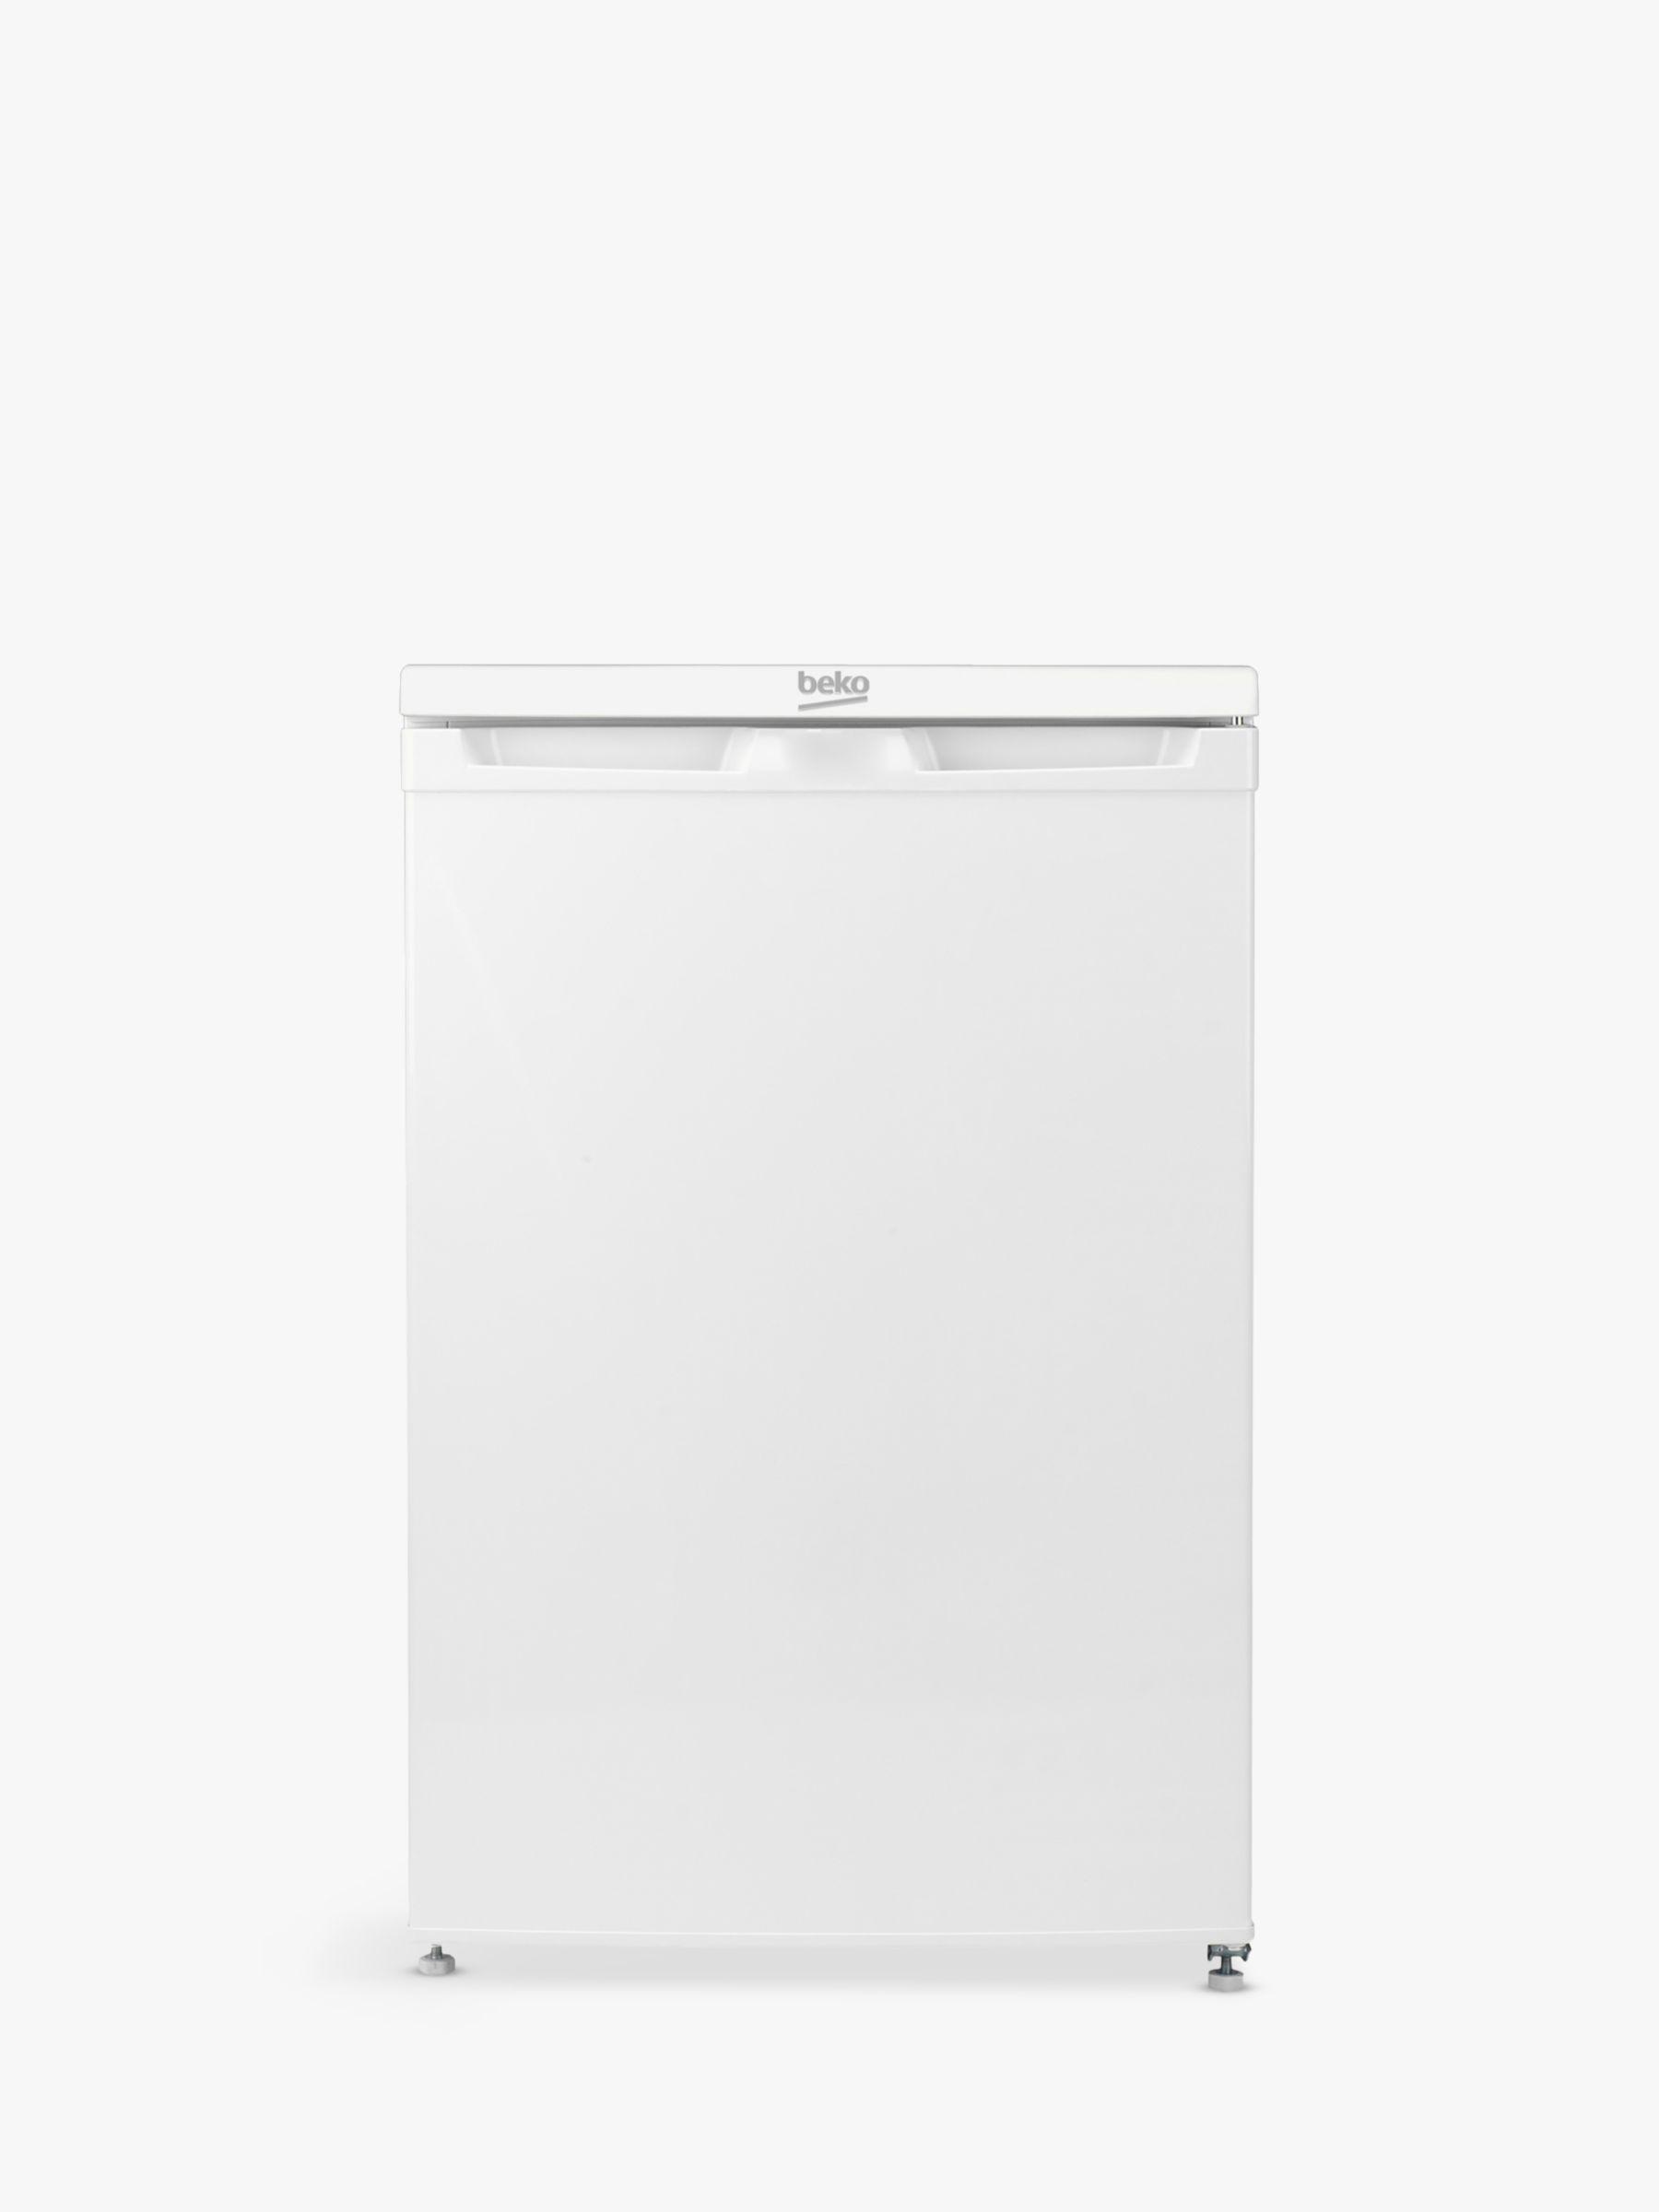 Beko Beko UFF584APW Freestanding Under Counter Freezer, A+ Energy Rating, White